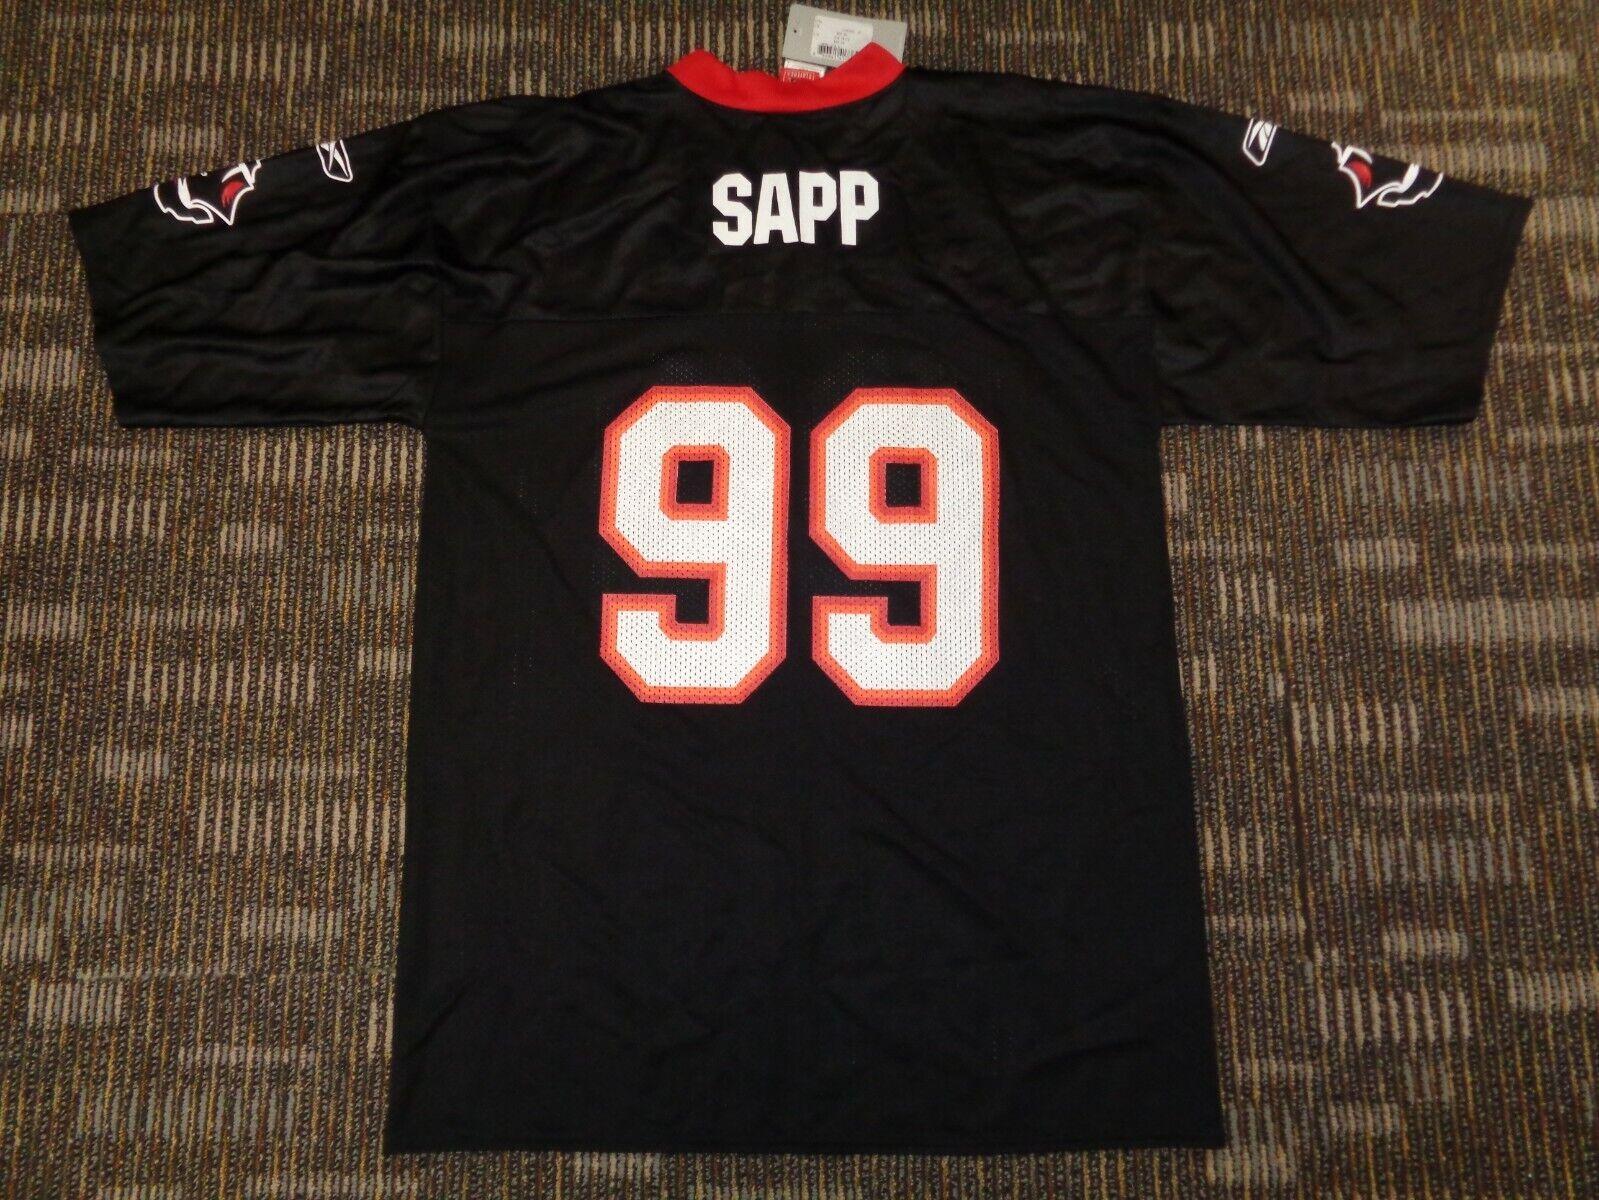 NWT WARREN SAPP 99 TAMPA BAY BUCCANEERS REEBOK BLACK NFL GAME FOOTBALL JERSEY  - $34.99